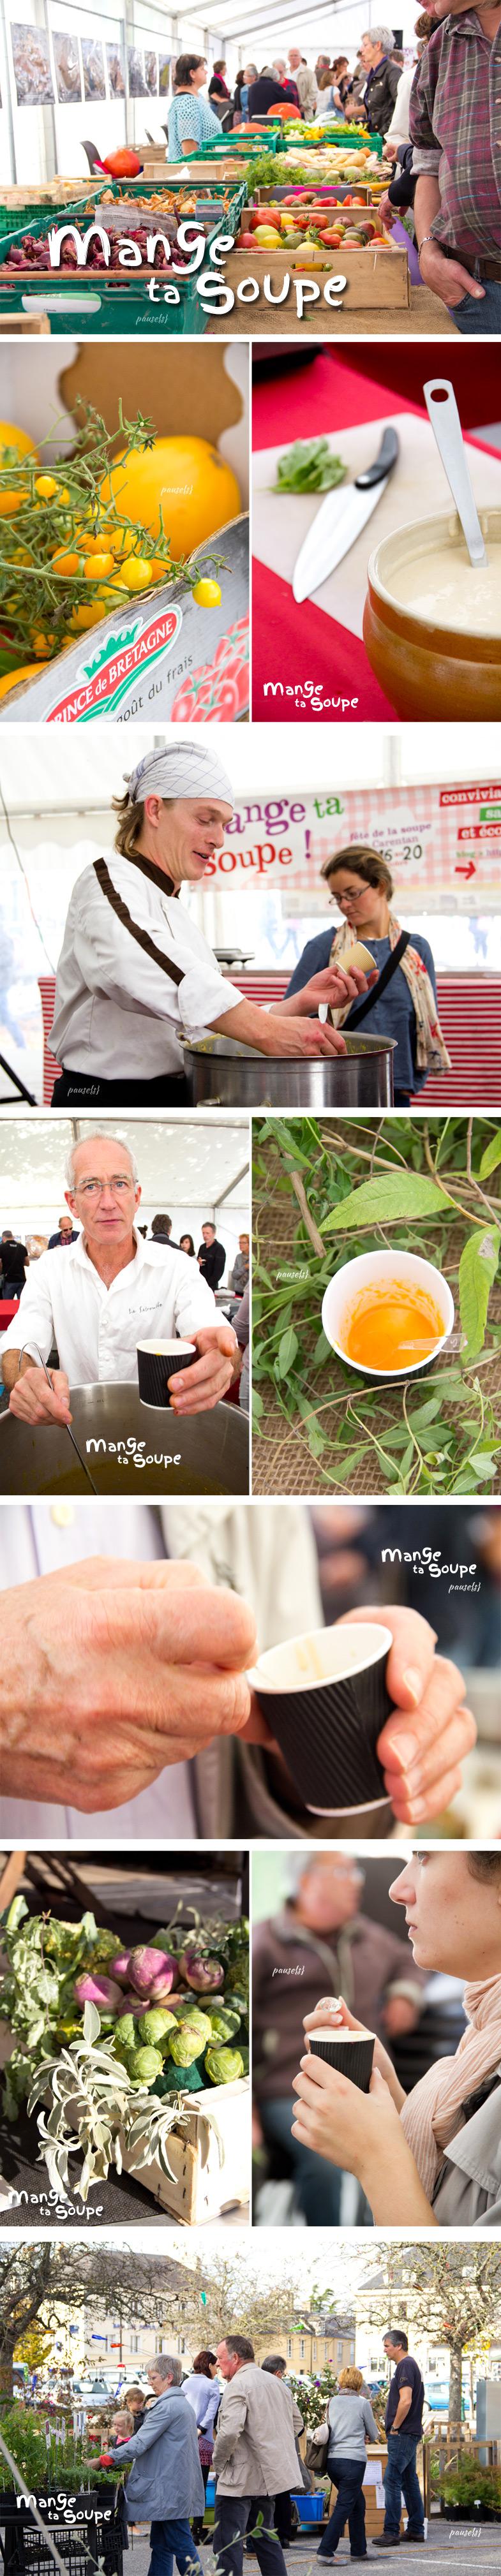 mange-ta-soupe01